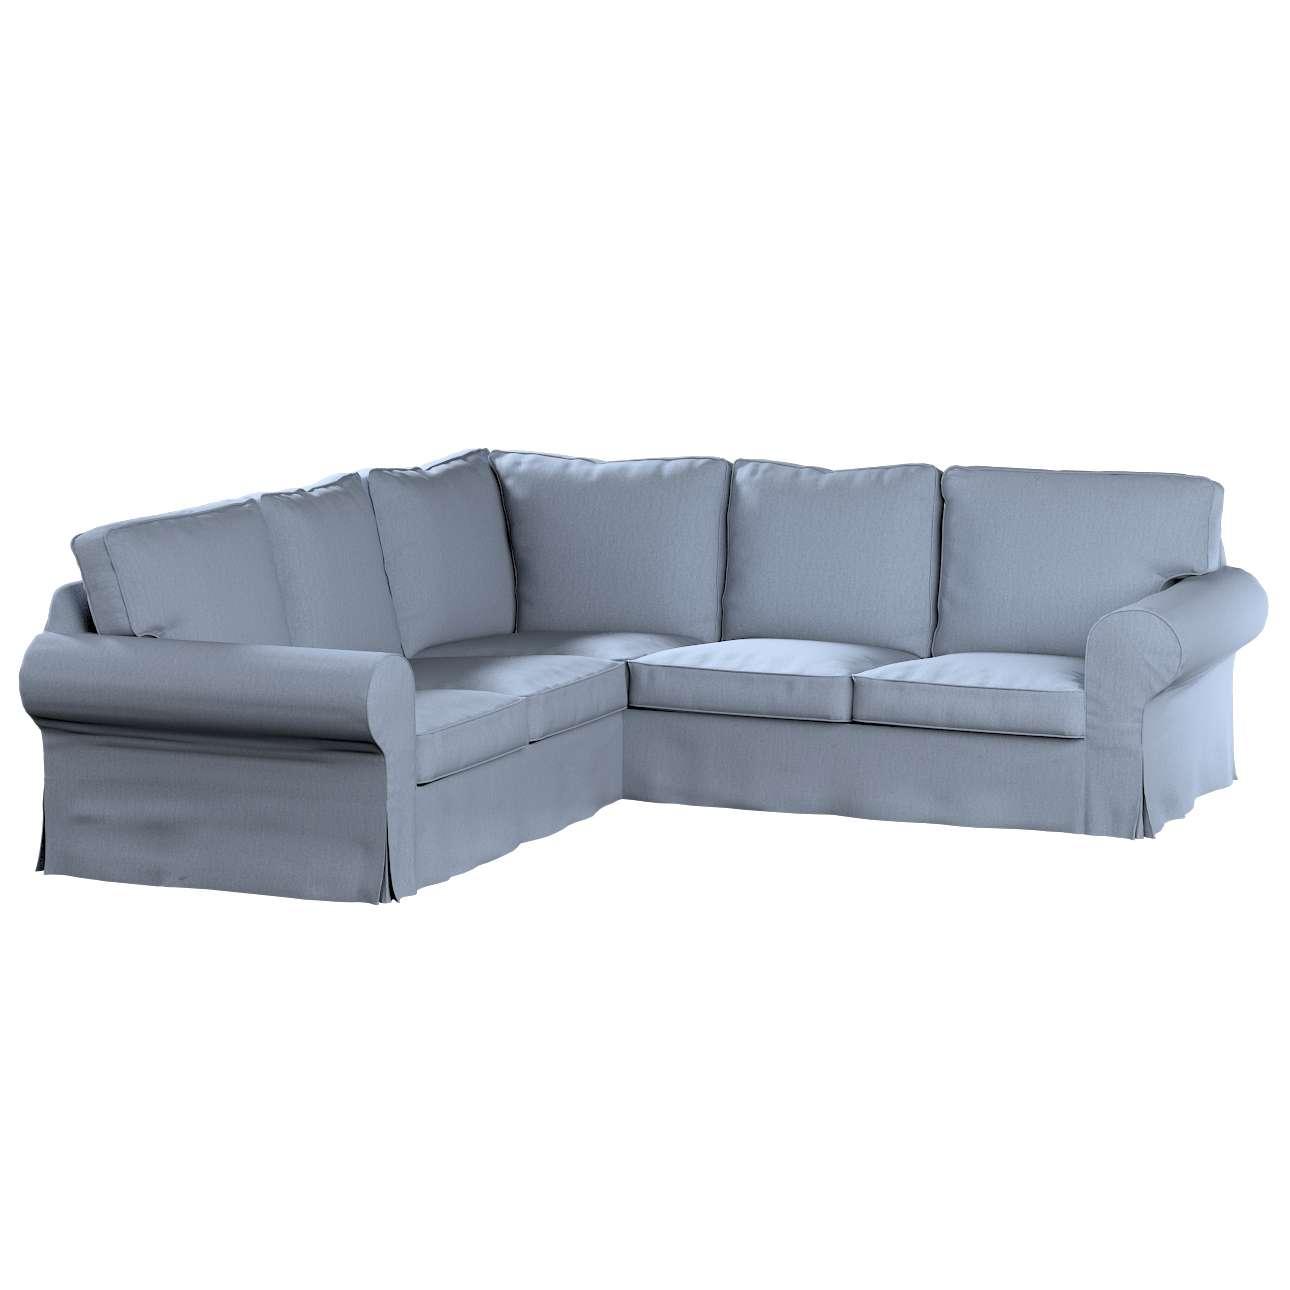 Ektorp kampinė sofa Ektorp kampinė sofa kolekcijoje Chenille, audinys: 702-13